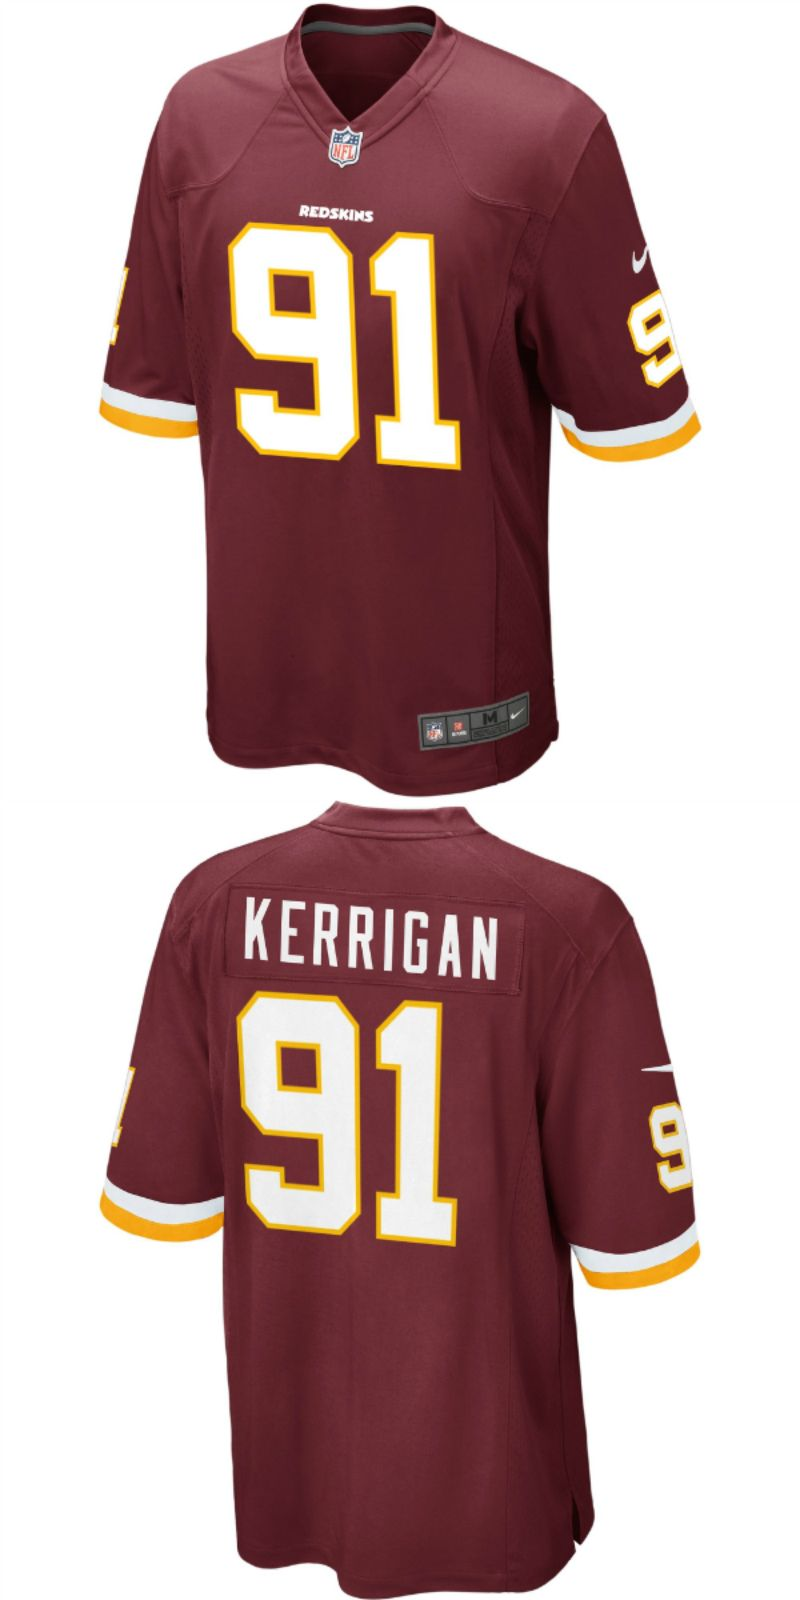 new style 3beba 39335 Ryan Kerrigan Washington Redskins football Jersey | NFL ...